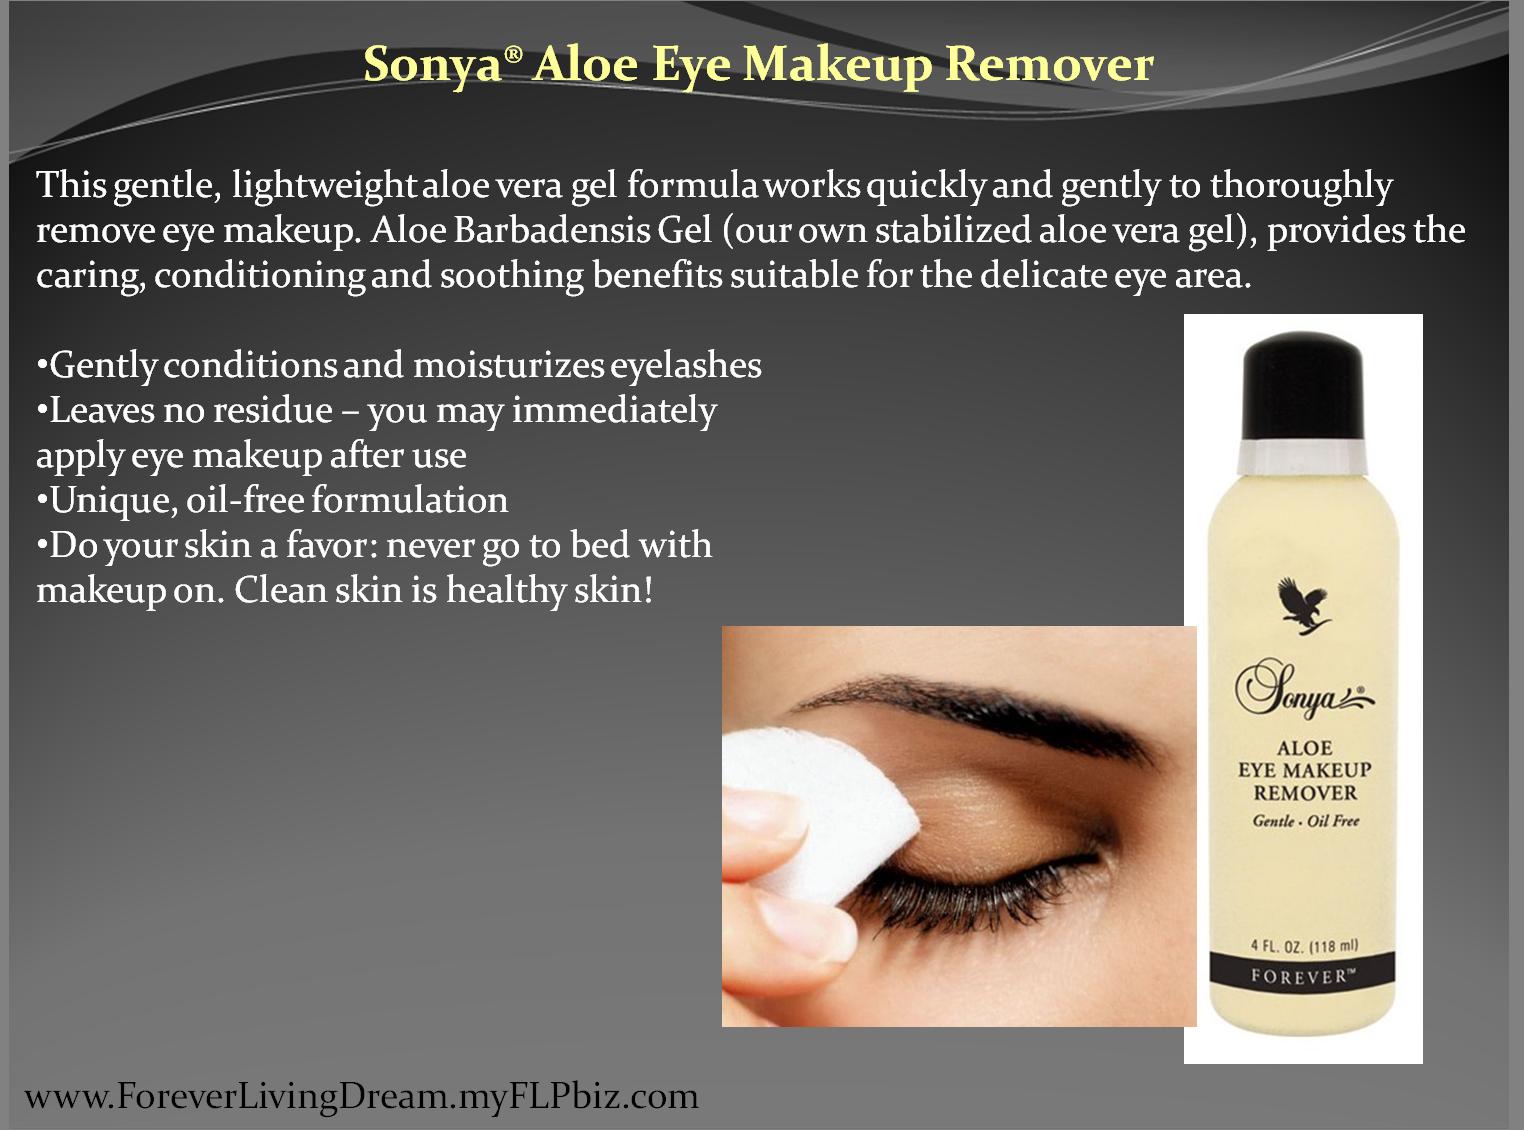 sonya u00ae aloe eye makeup remover